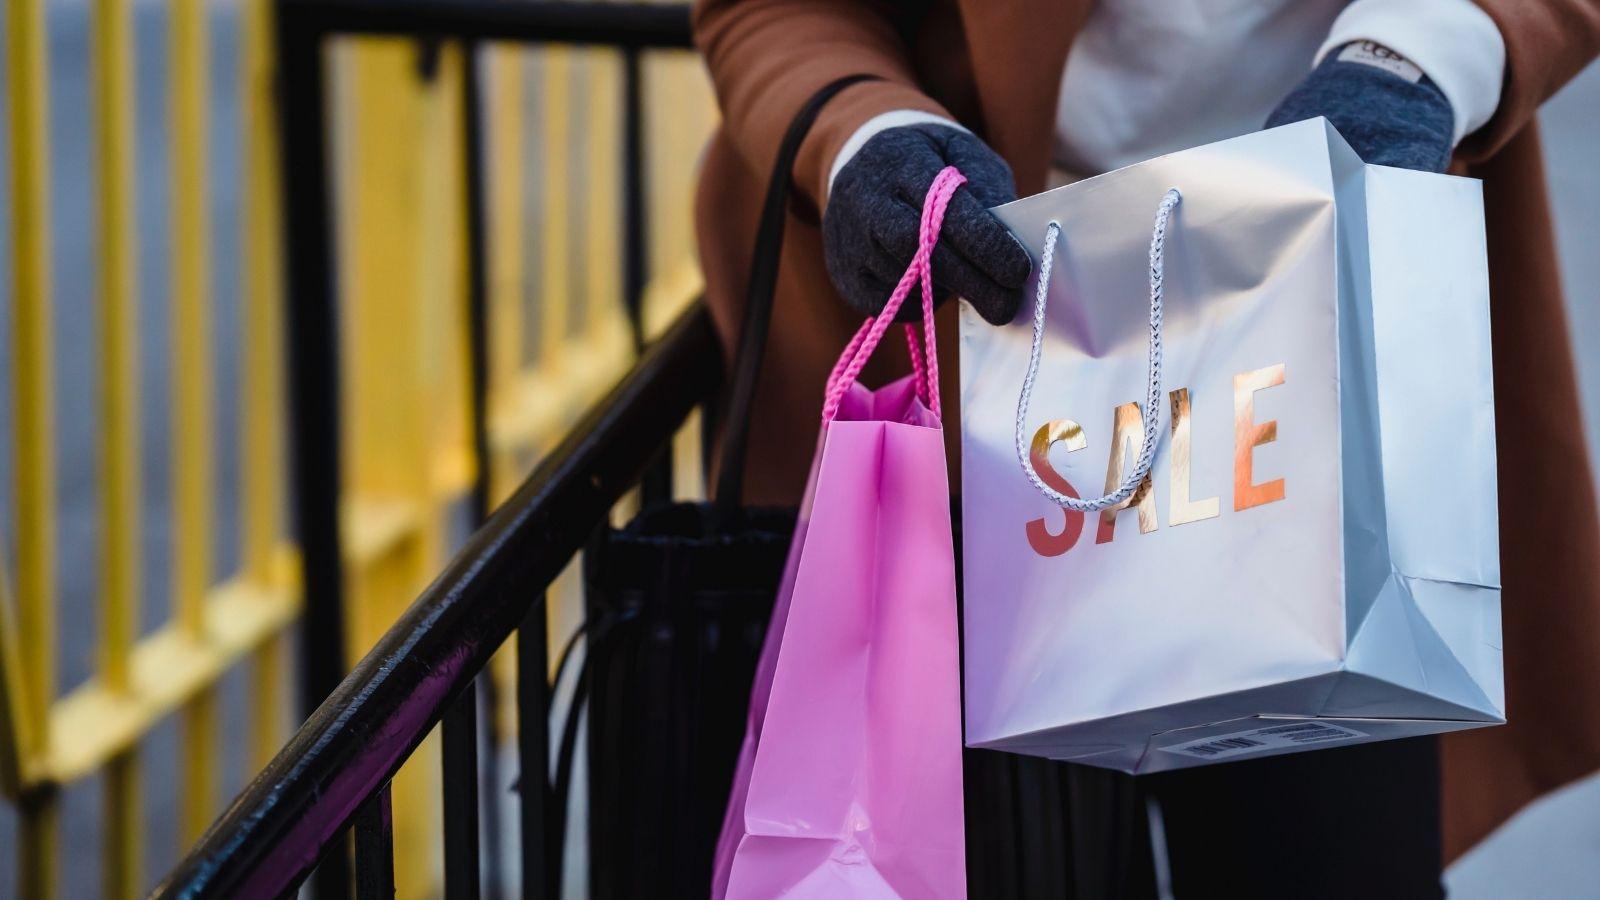 RAPORT: Shopping online – jak kupują Polacy? ARC Opinia i Rynek mediarun e shopping